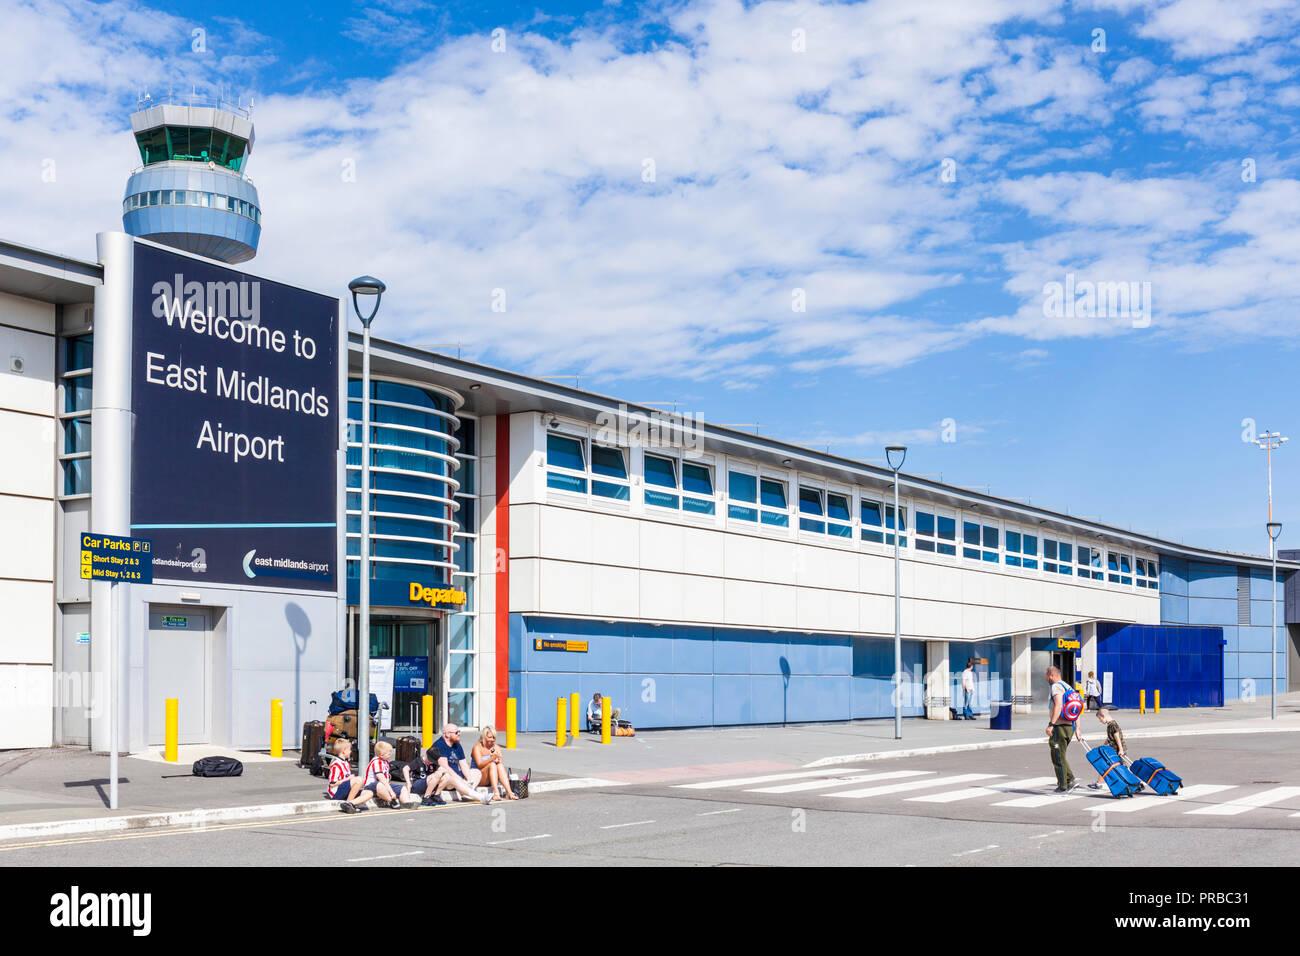 East Midlands Airport Passengers heading towards the departures entrance east midlands airport terminal building Castle Donnington Leicestershire UK - Stock Image